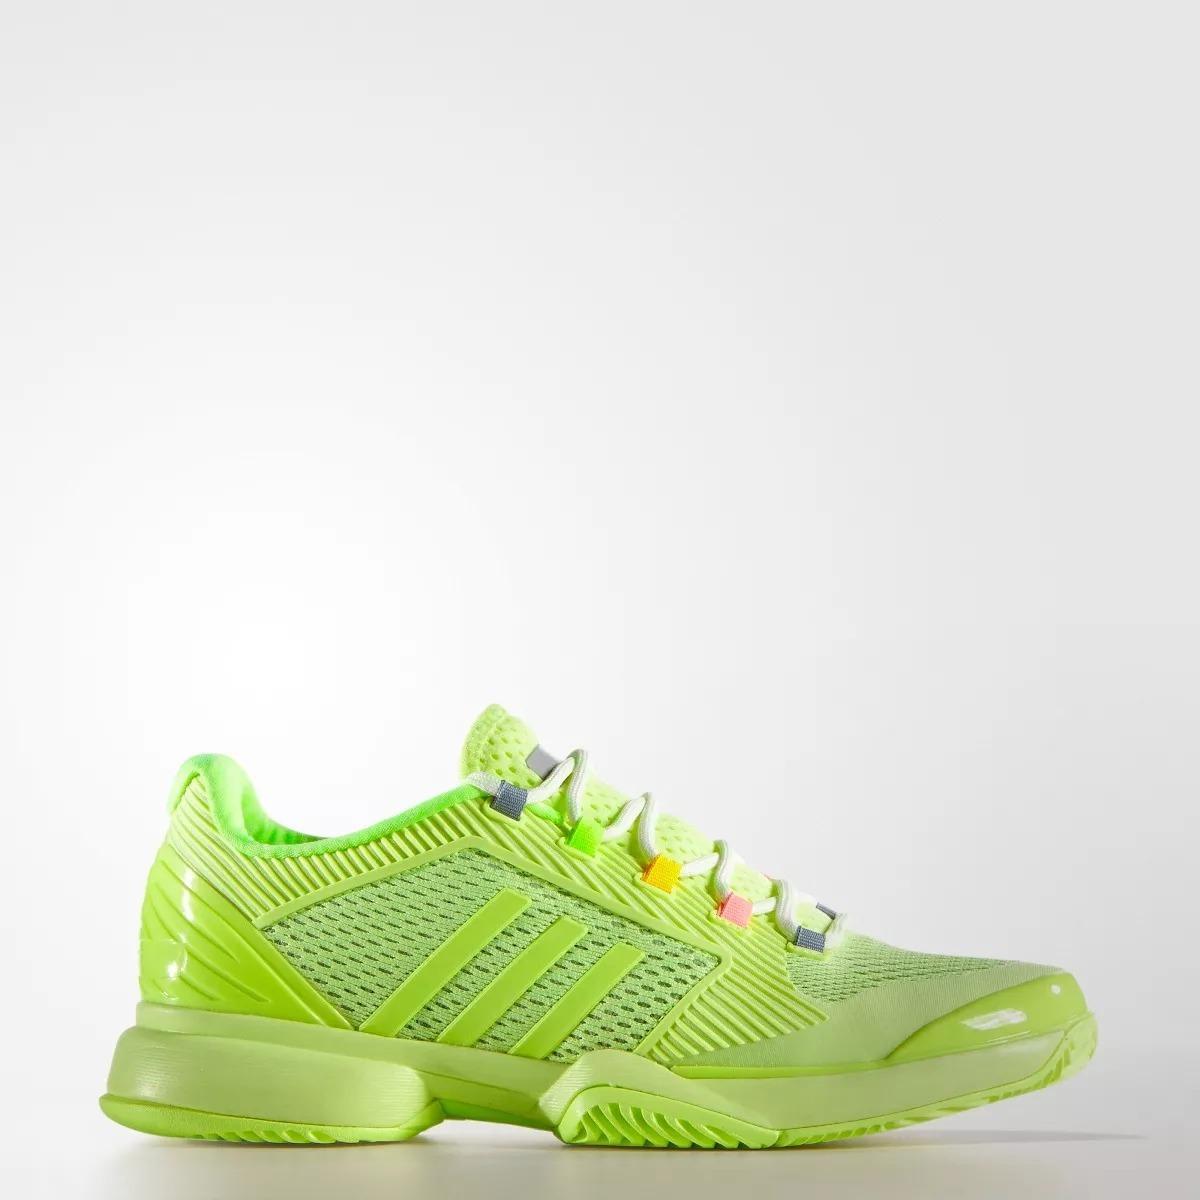 019ace9ad8977 tênis adidas asmc barricade 2015 - by stella mccartney. Carregando zoom.